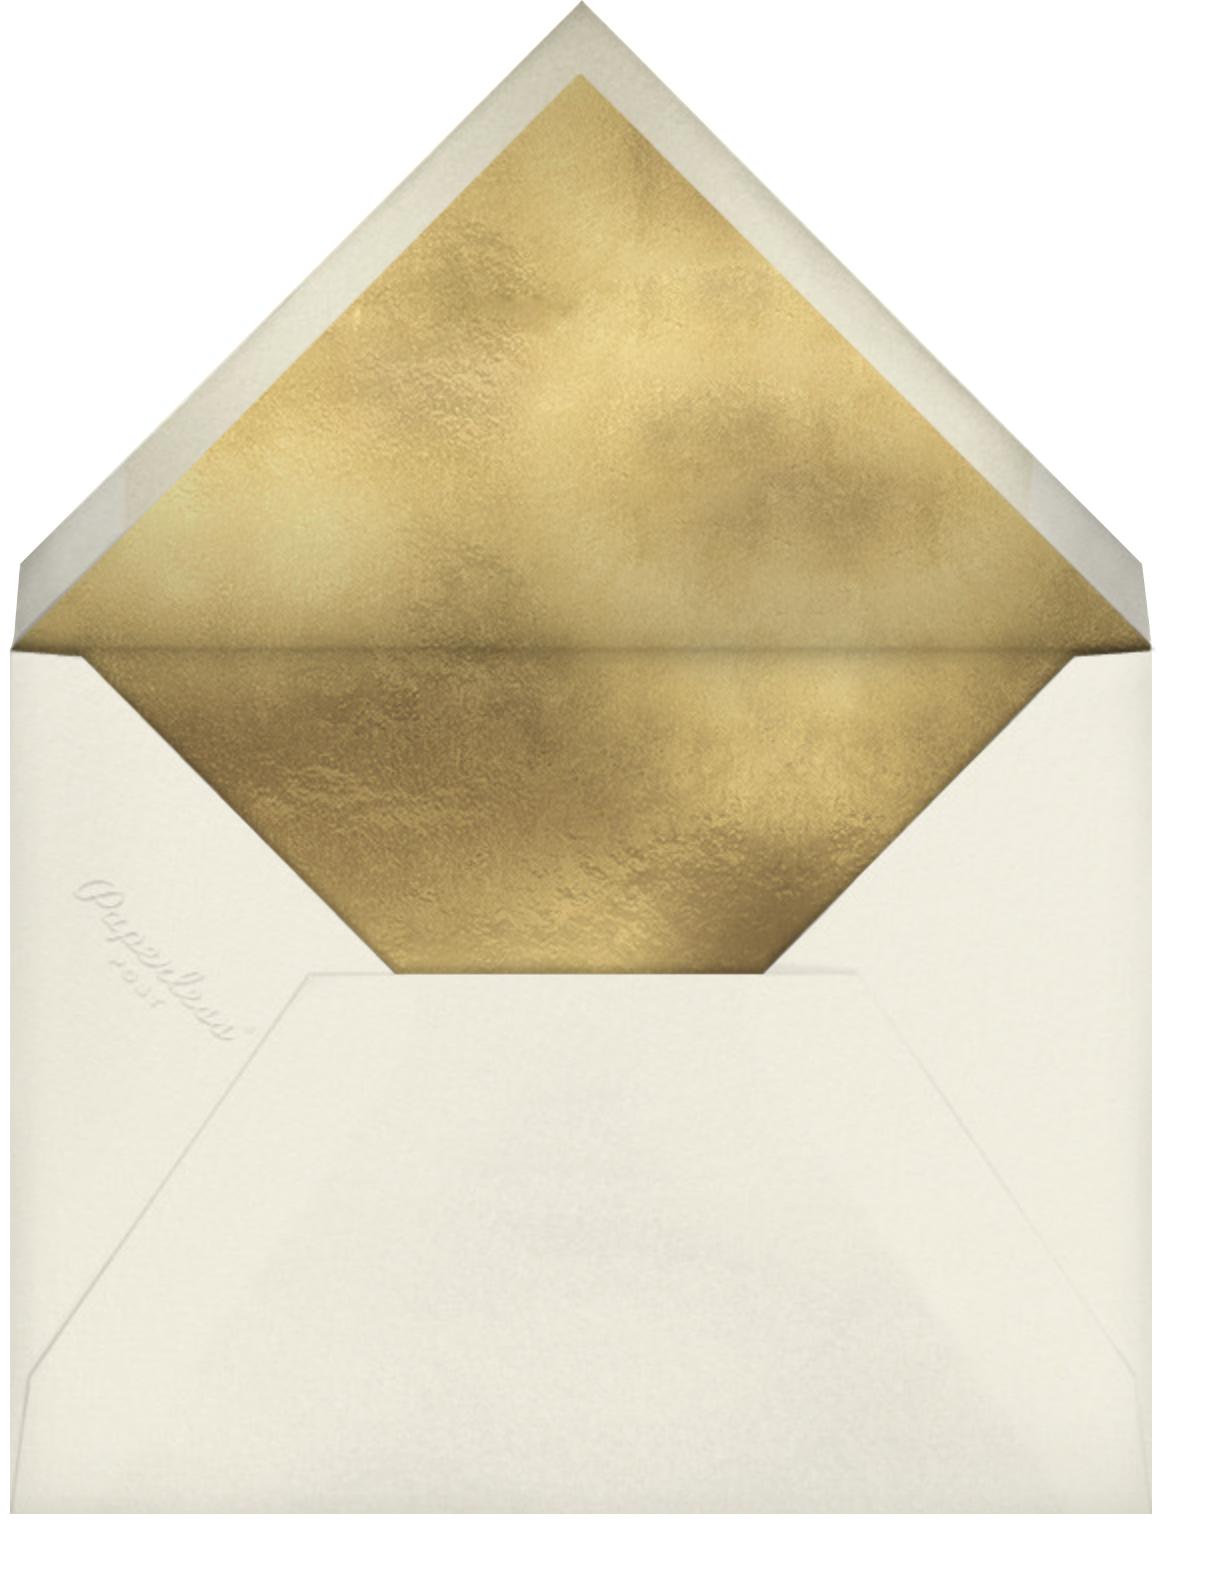 Gold Unikko - Crimson - Marimekko - Lunar New Year - envelope back